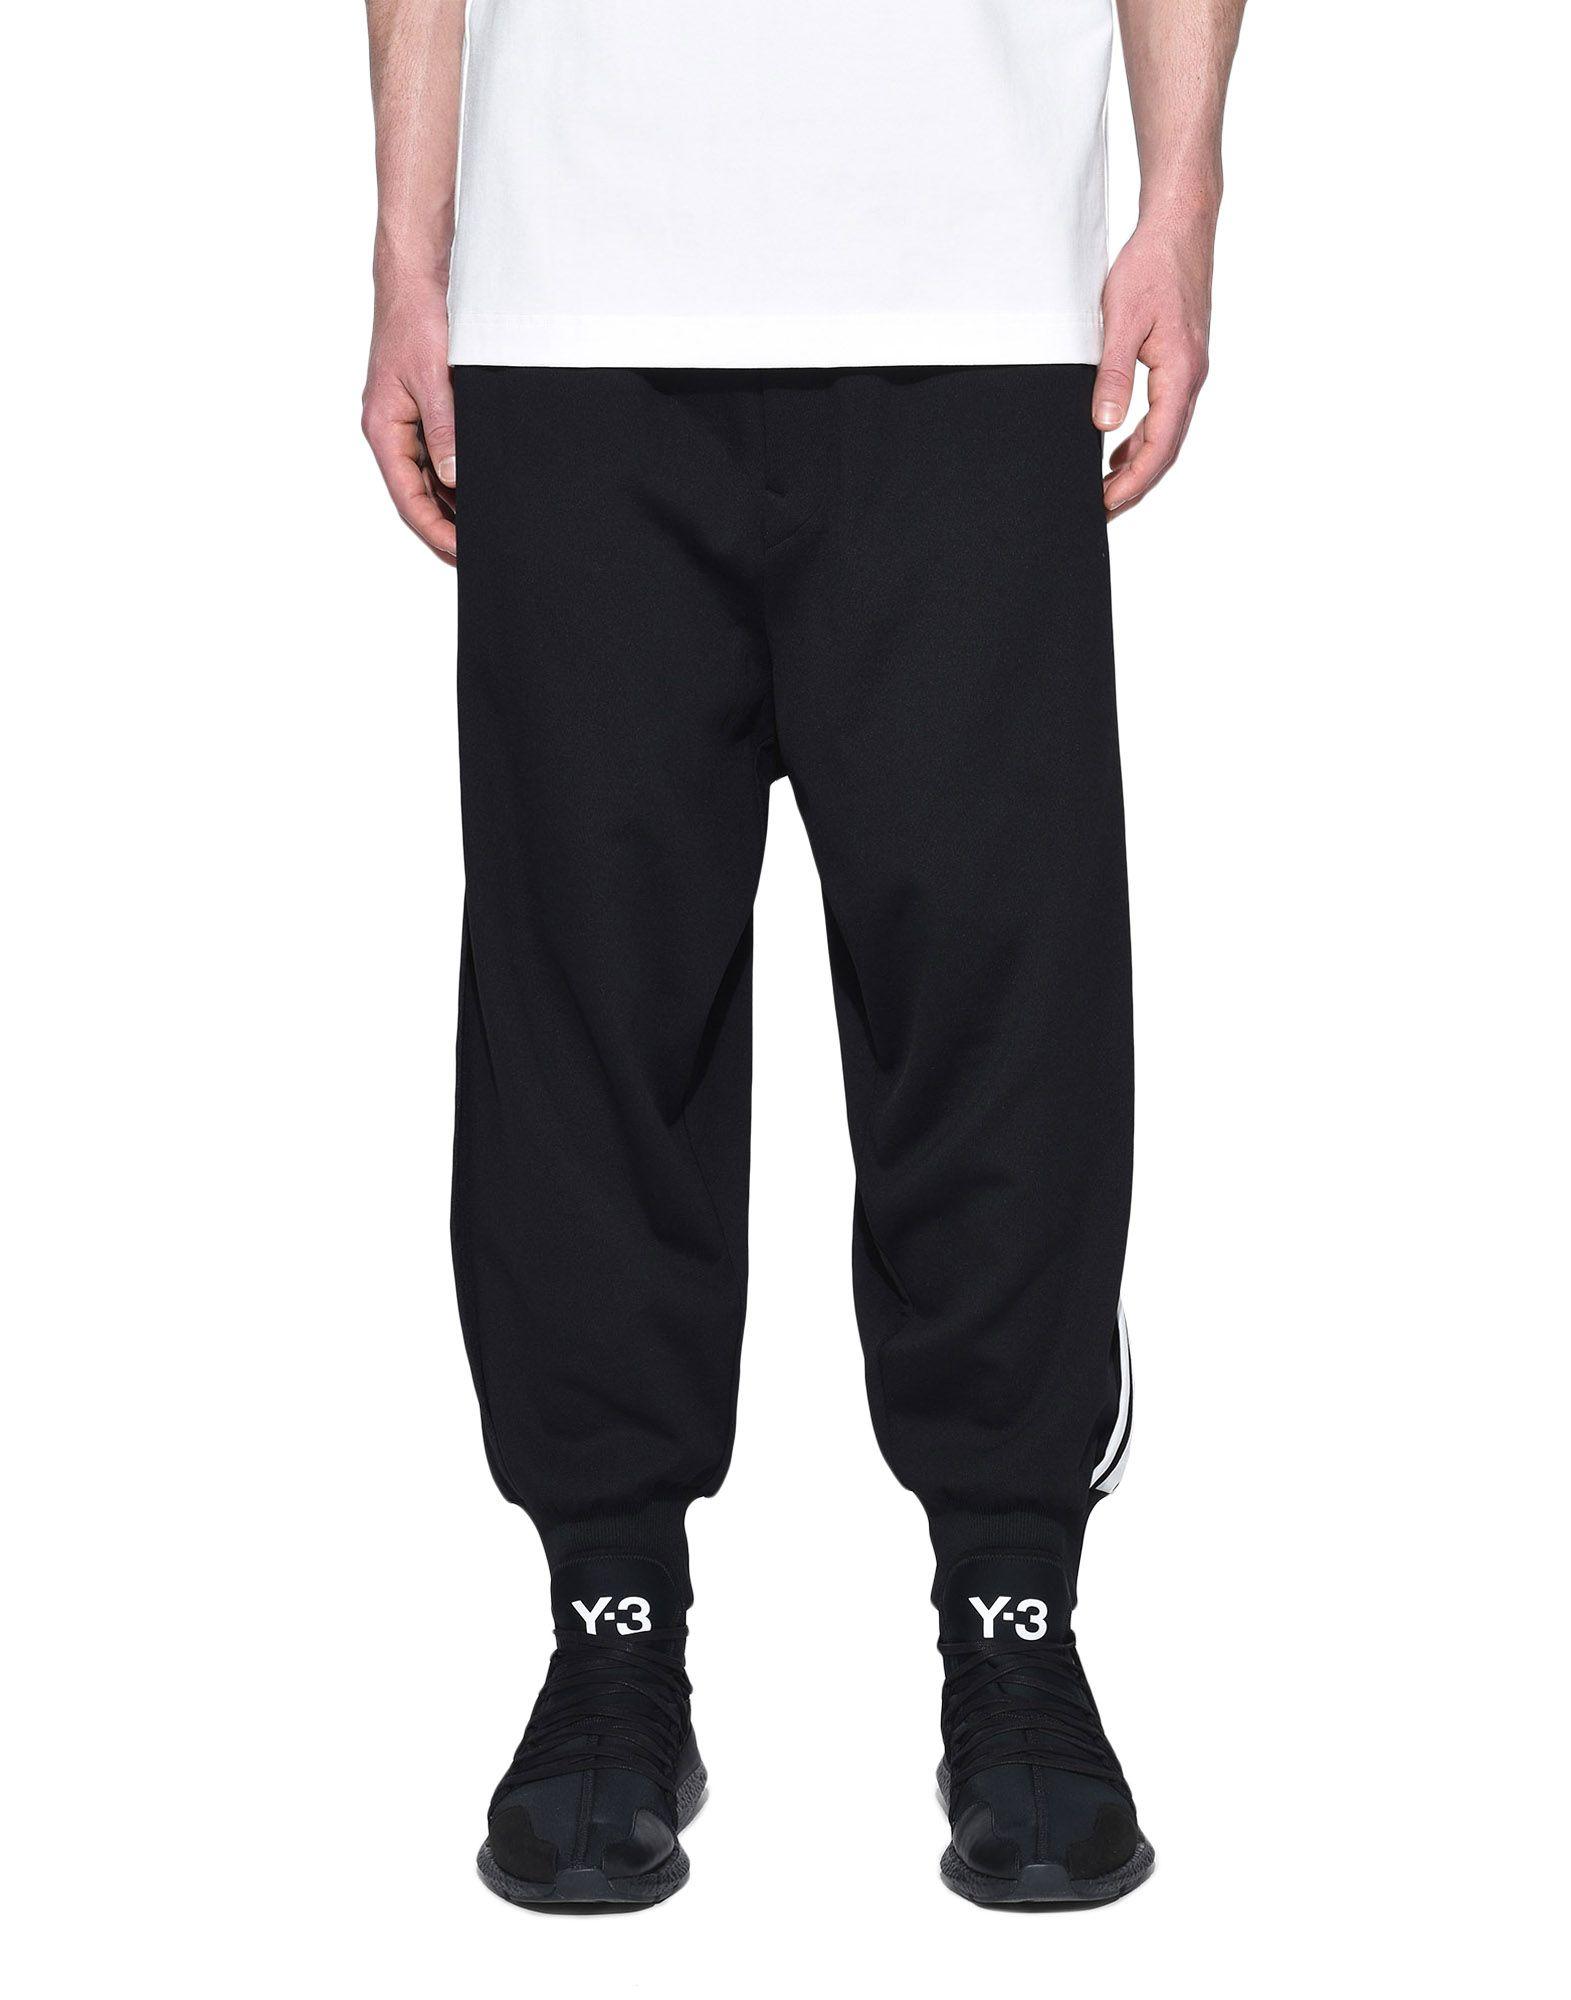 Y-3 Y-3 3-Stripes Selvedge Matte Track Pants Track pant Man r